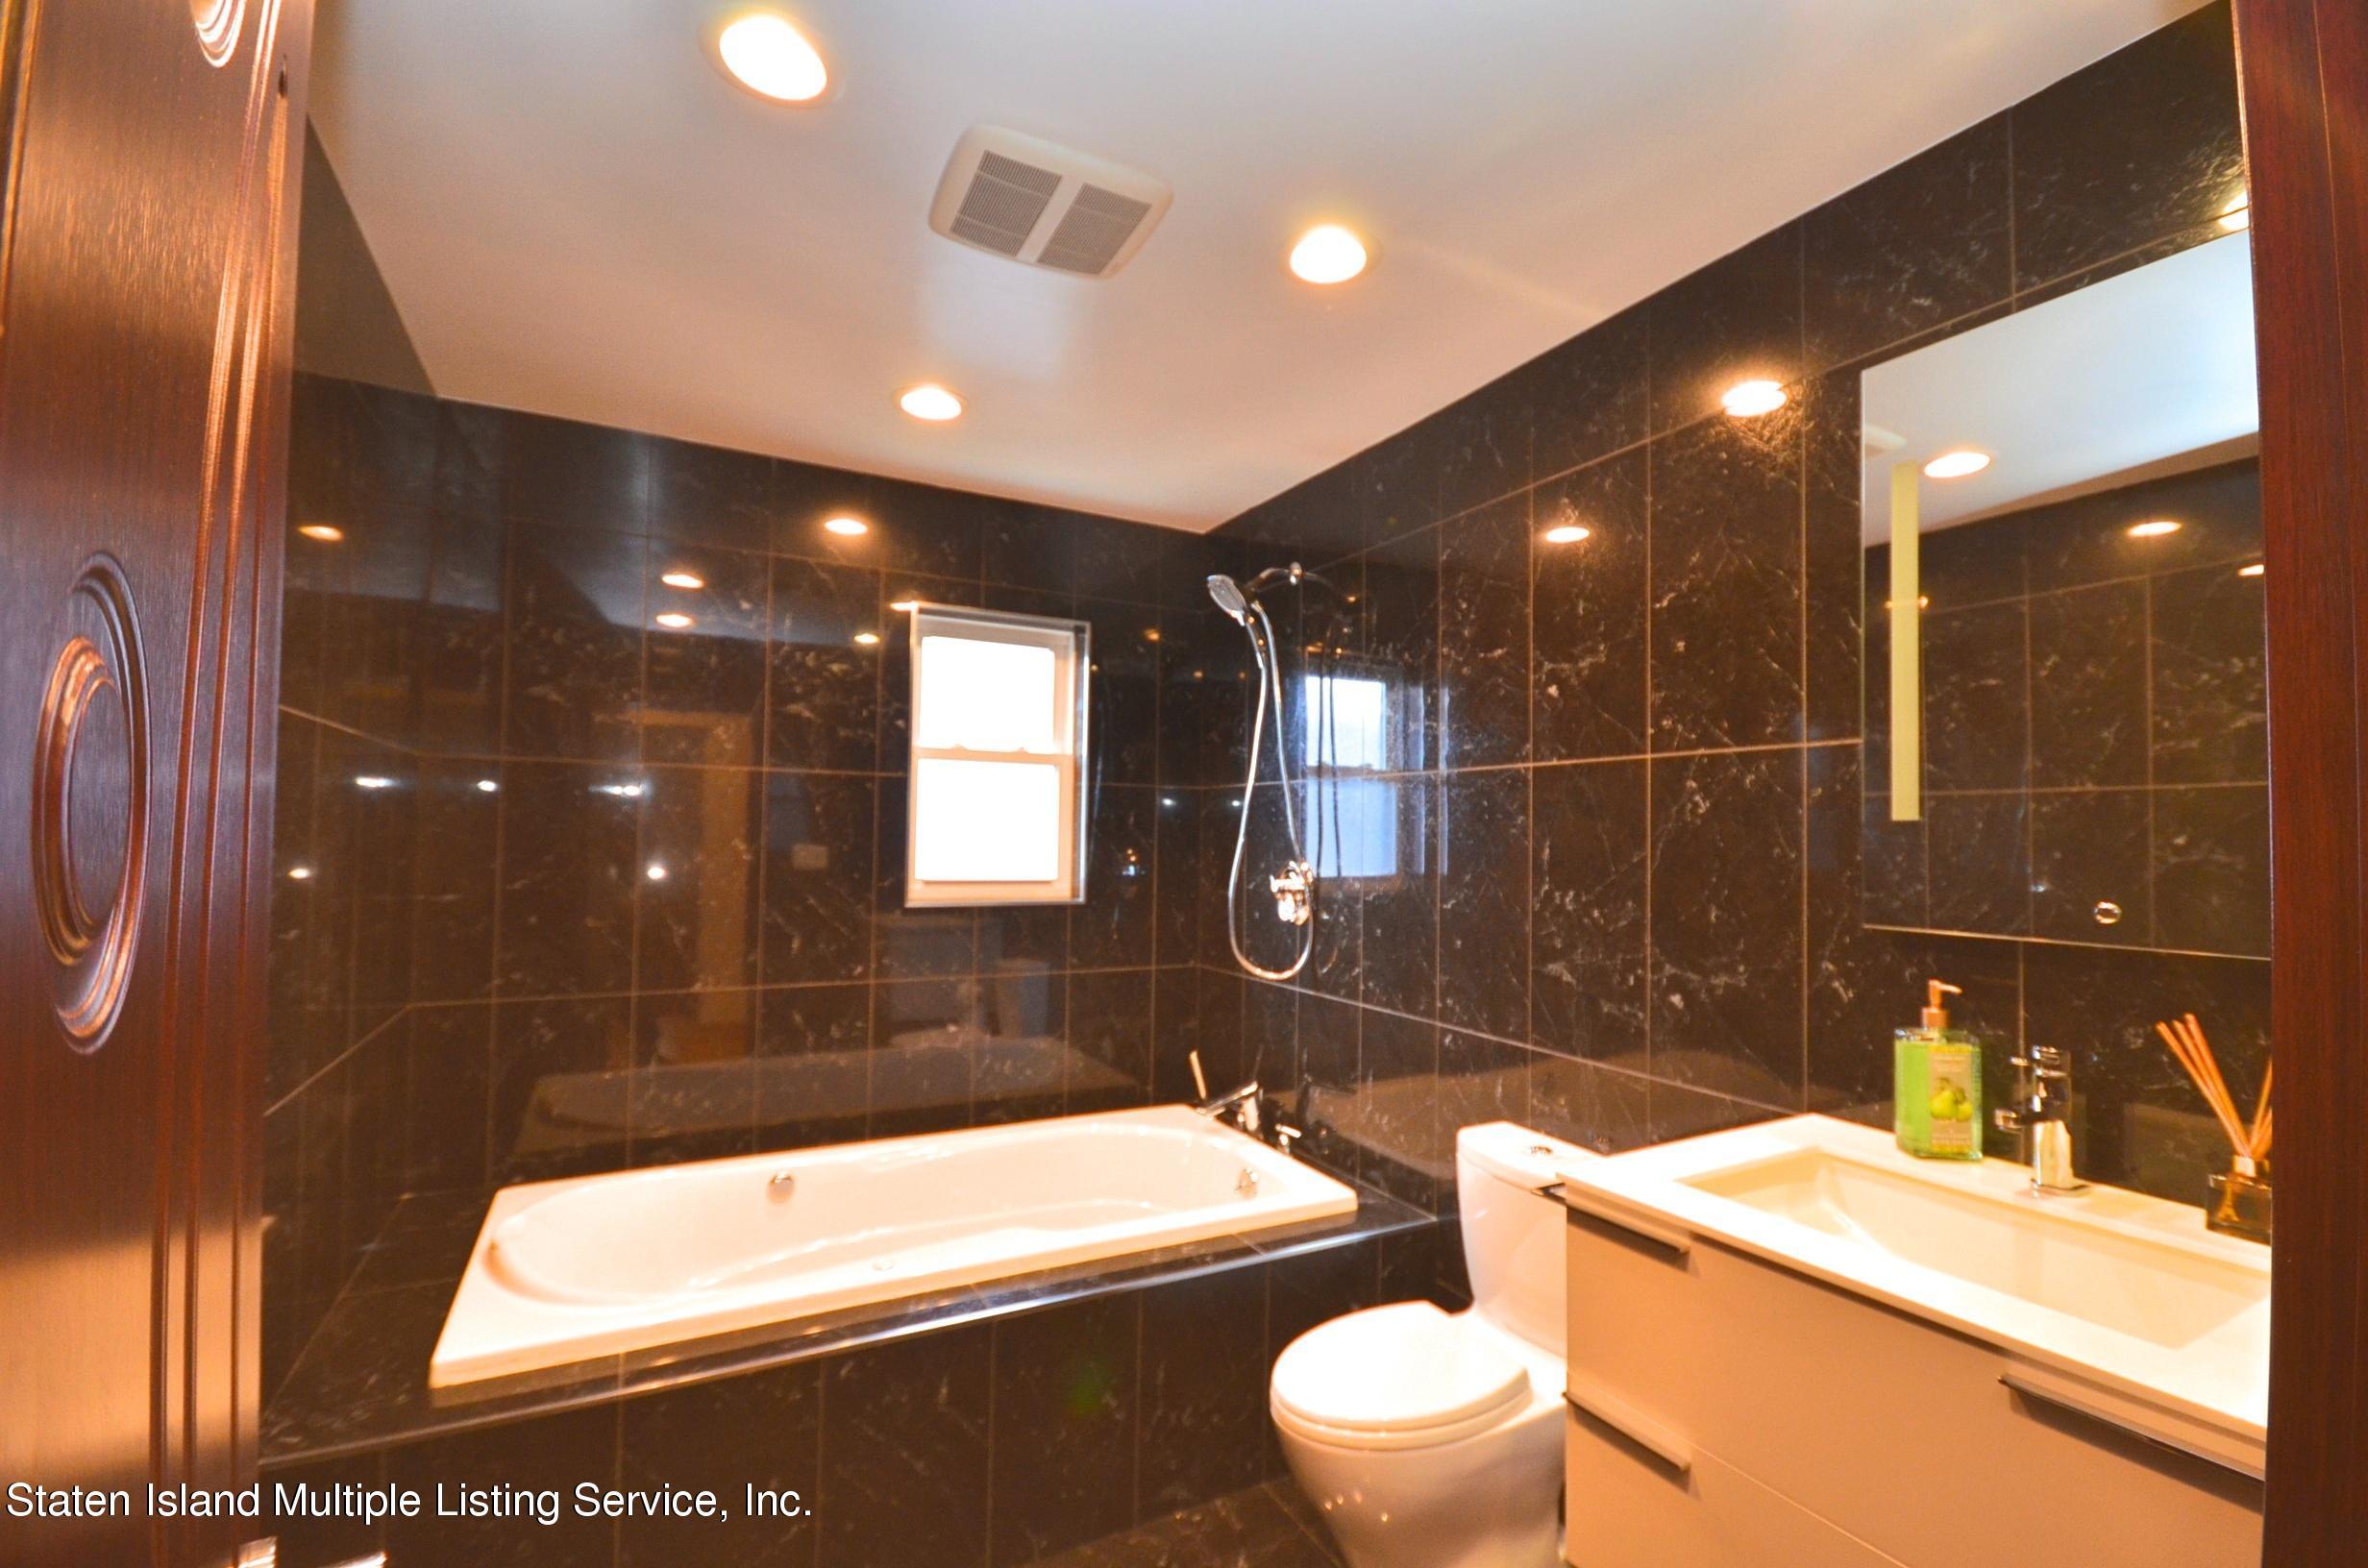 Single Family - Detached 48 Ocean Terrace  Staten Island, NY 10314, MLS-1142240-18